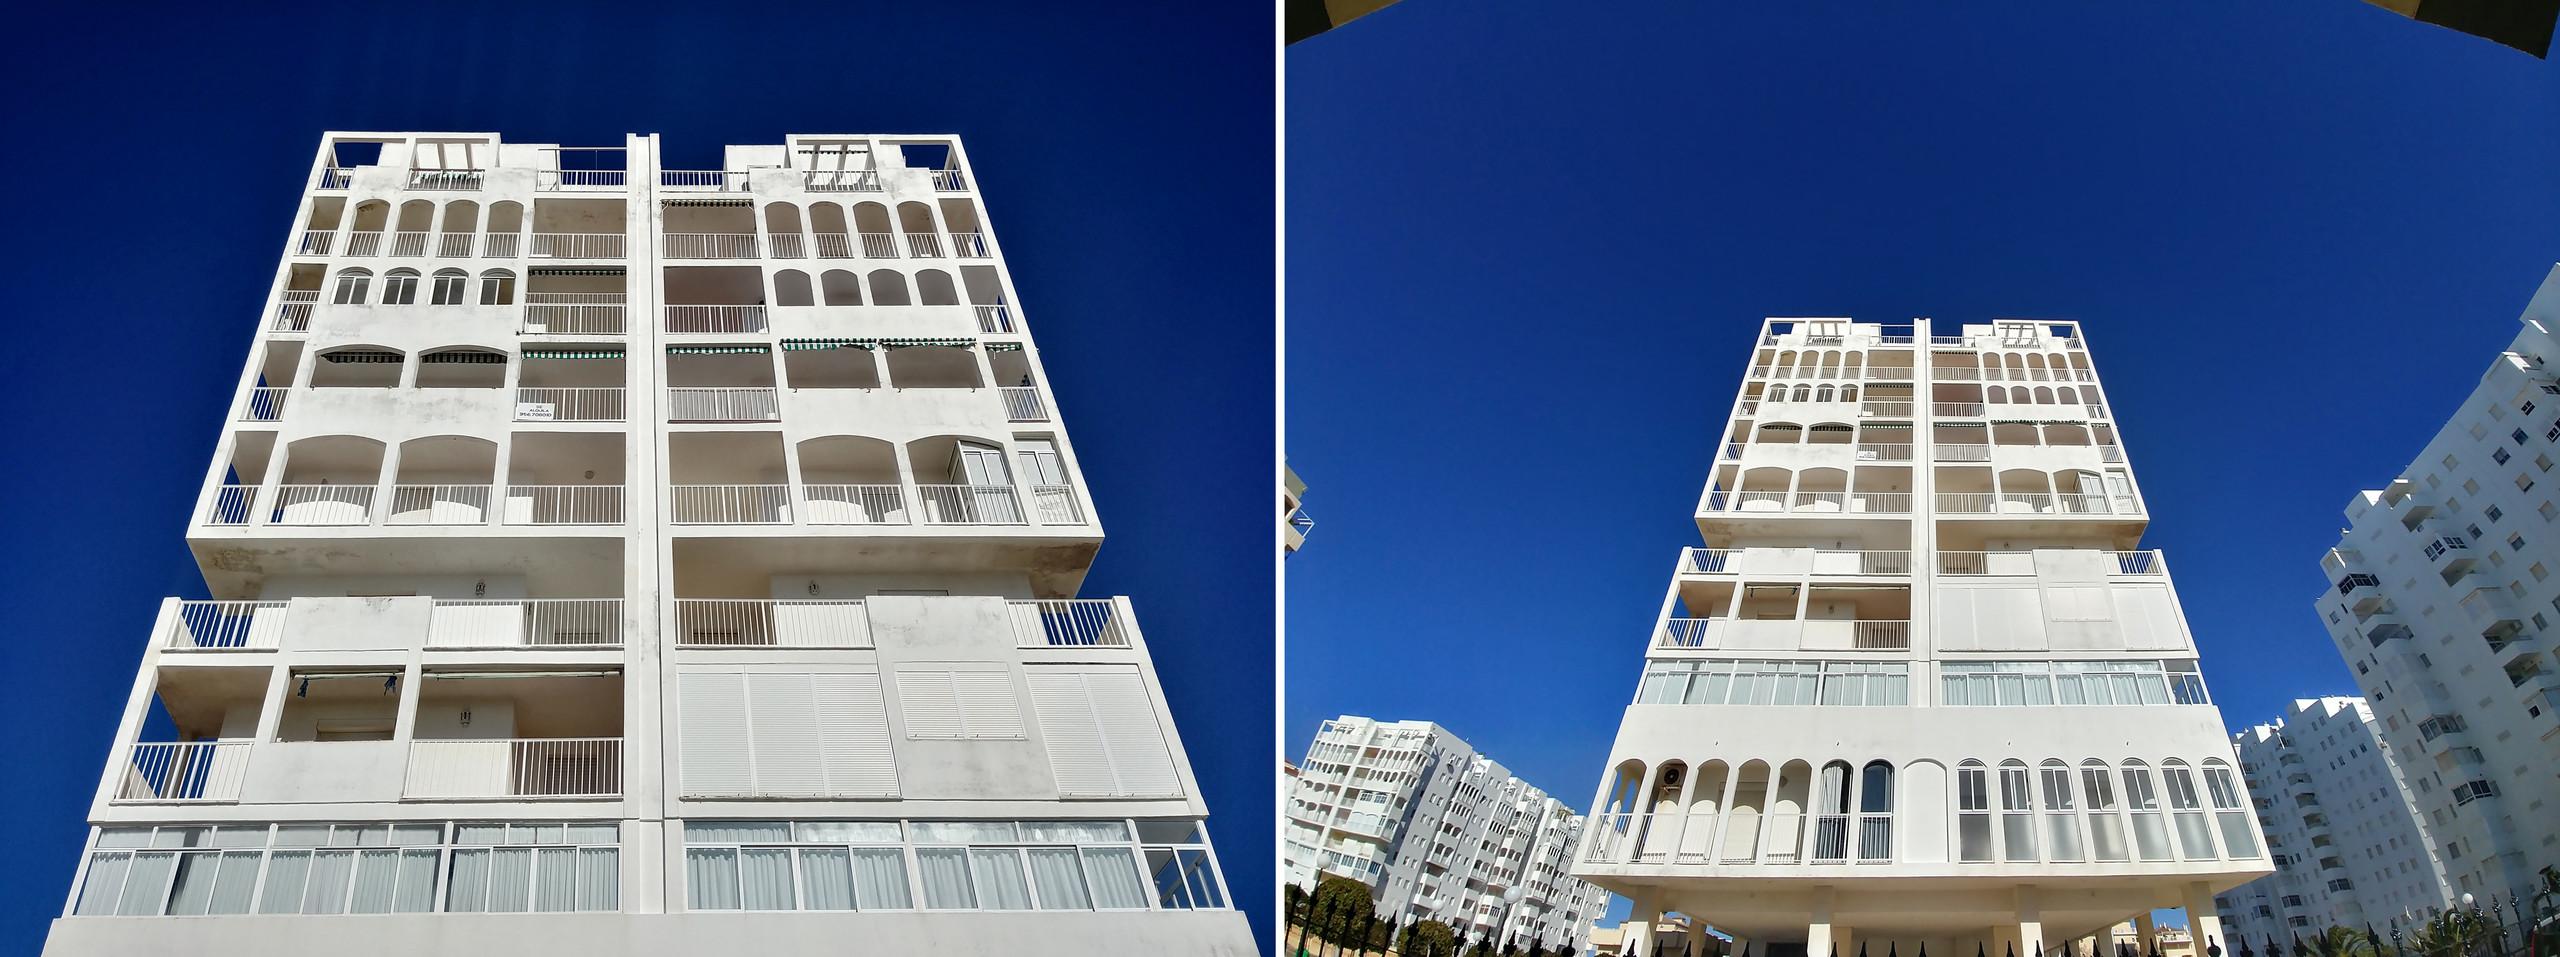 LG G6: cámara principal vs angular